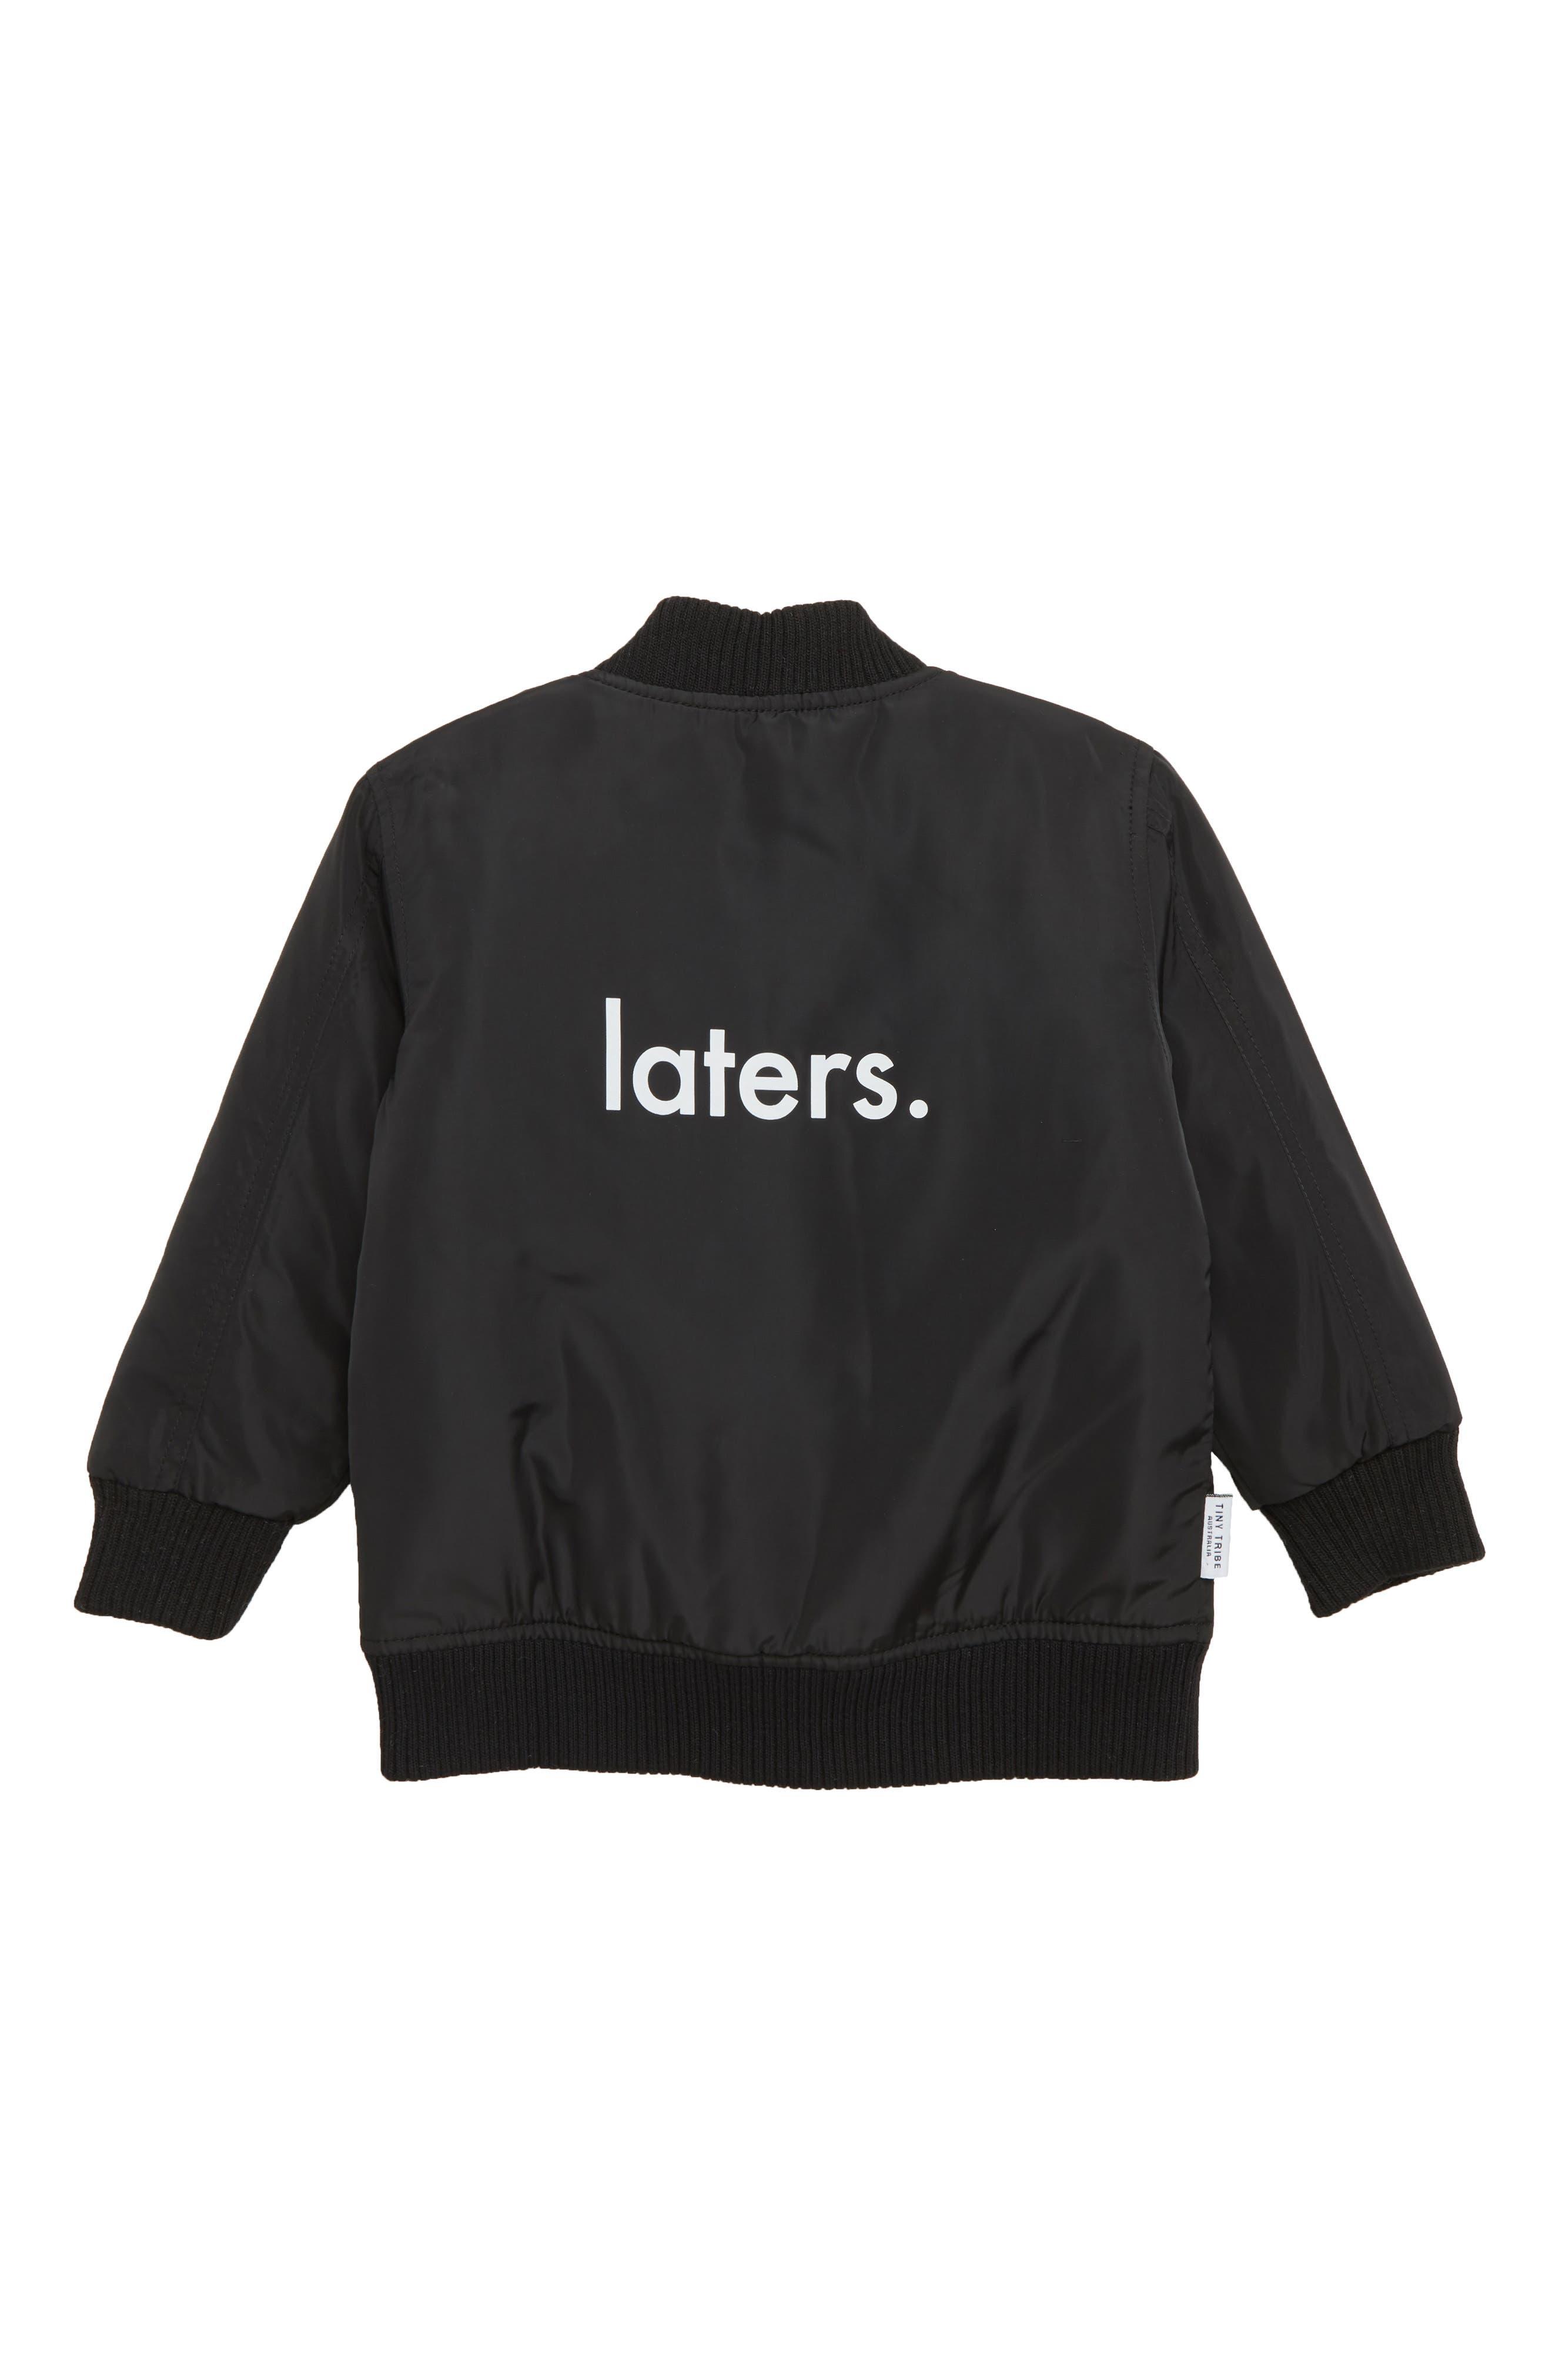 Laters Bomber Jacket,                             Alternate thumbnail 2, color,                             BLACK